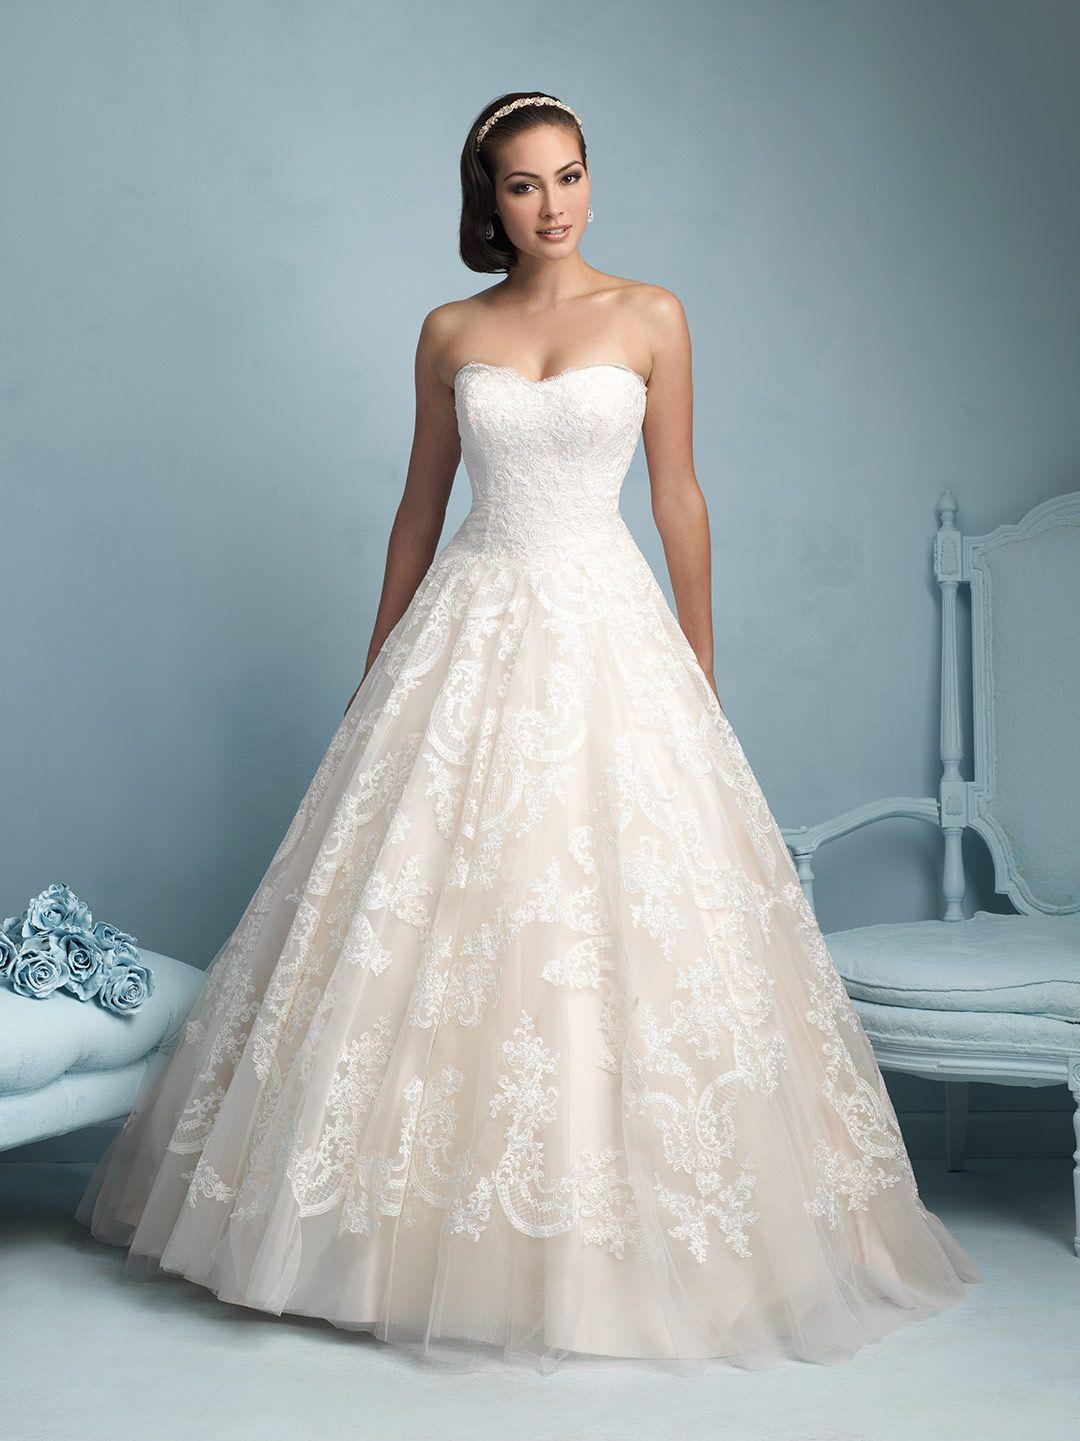 Allure wedding dress  Allure  Available  LOWS BRIDAL  wedding dresses  Pinterest